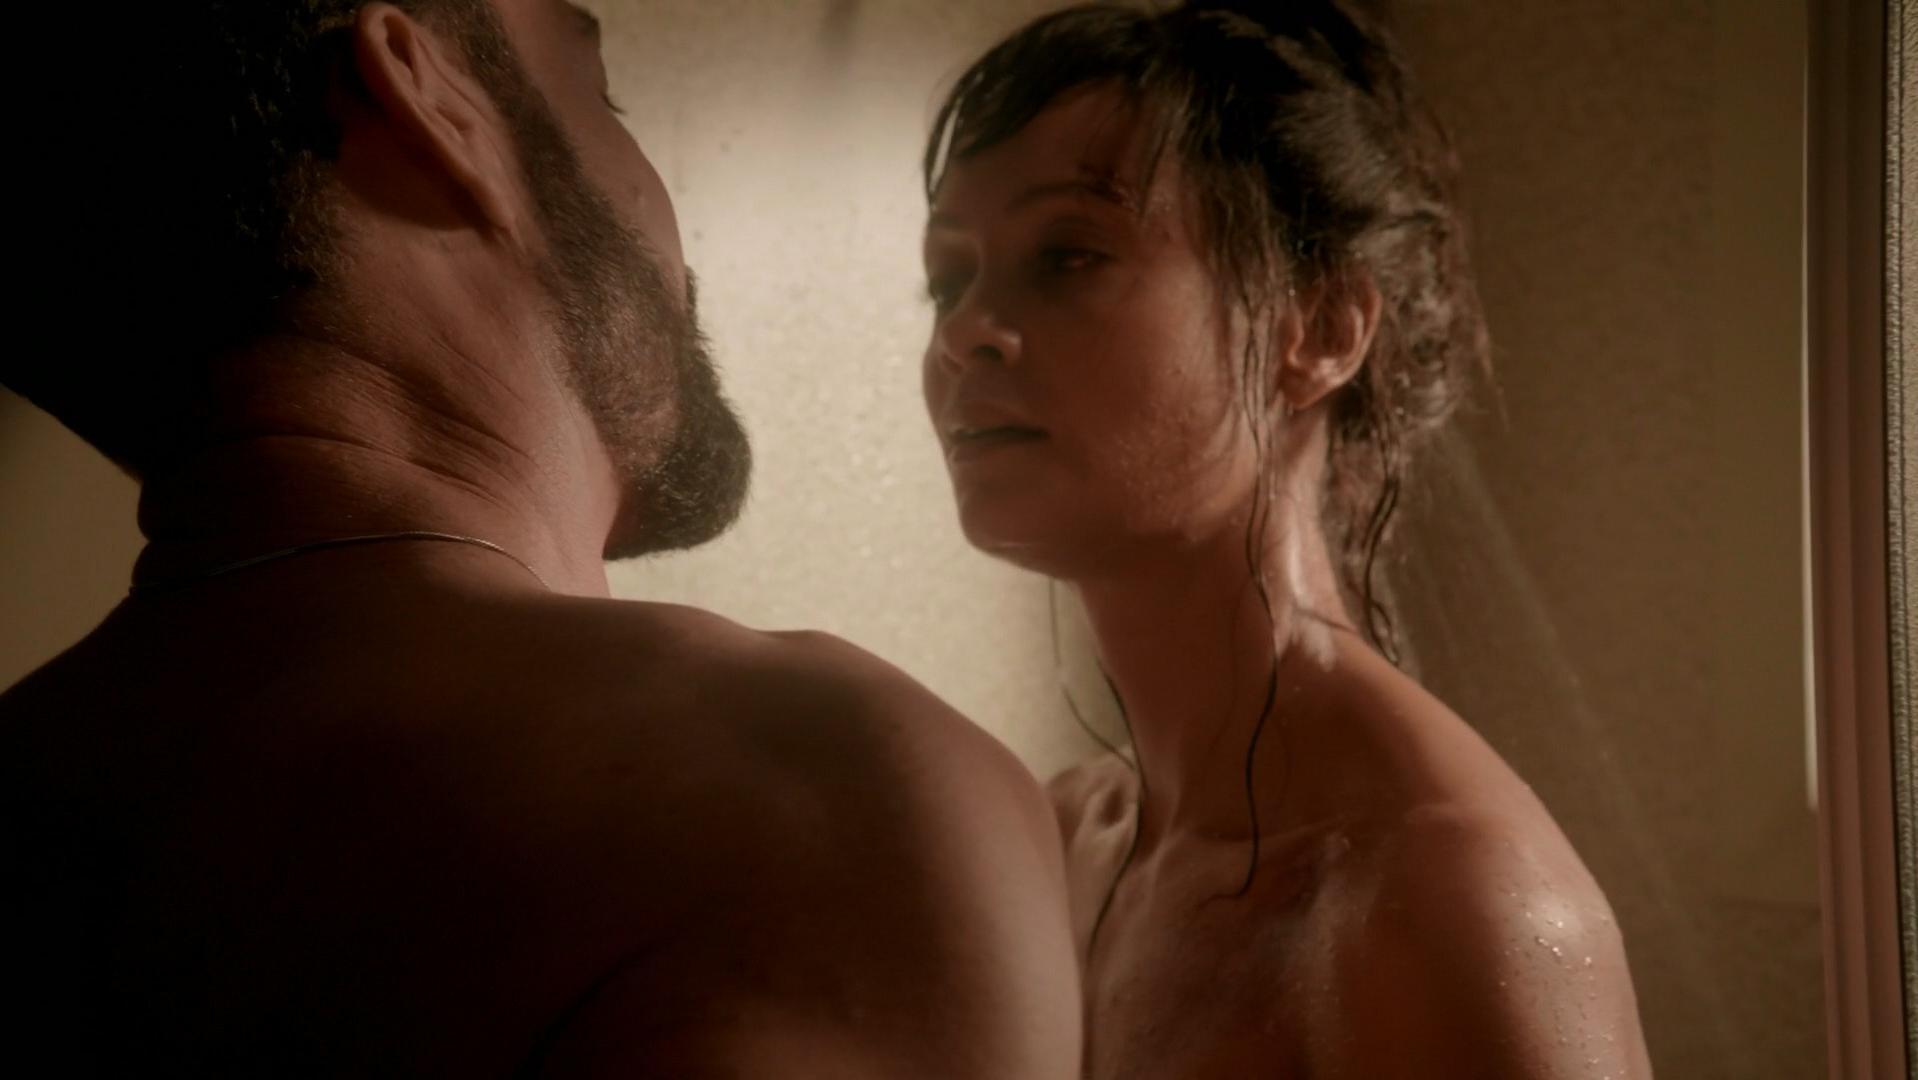 Thandie Newton nude - Rogue s01e06-07 (2013)